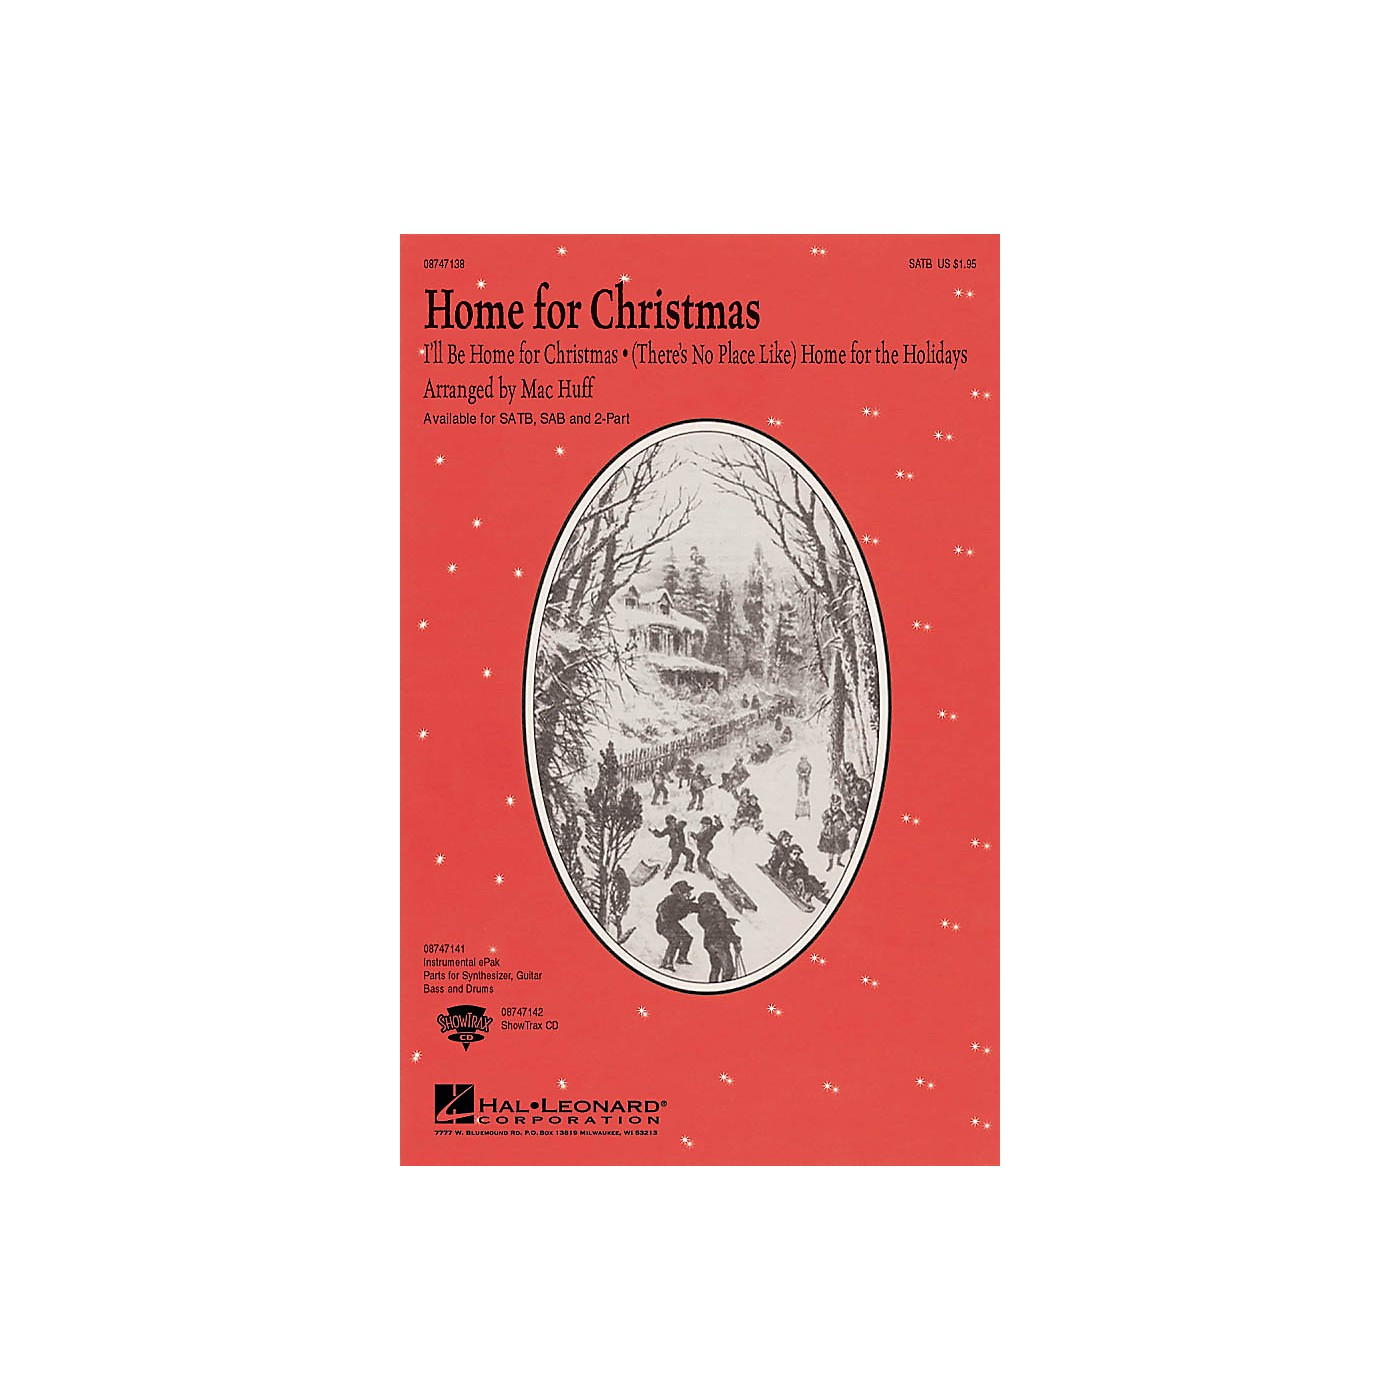 Hal Leonard Home for Christmas (Medley) SATB arranged by Mac Huff thumbnail